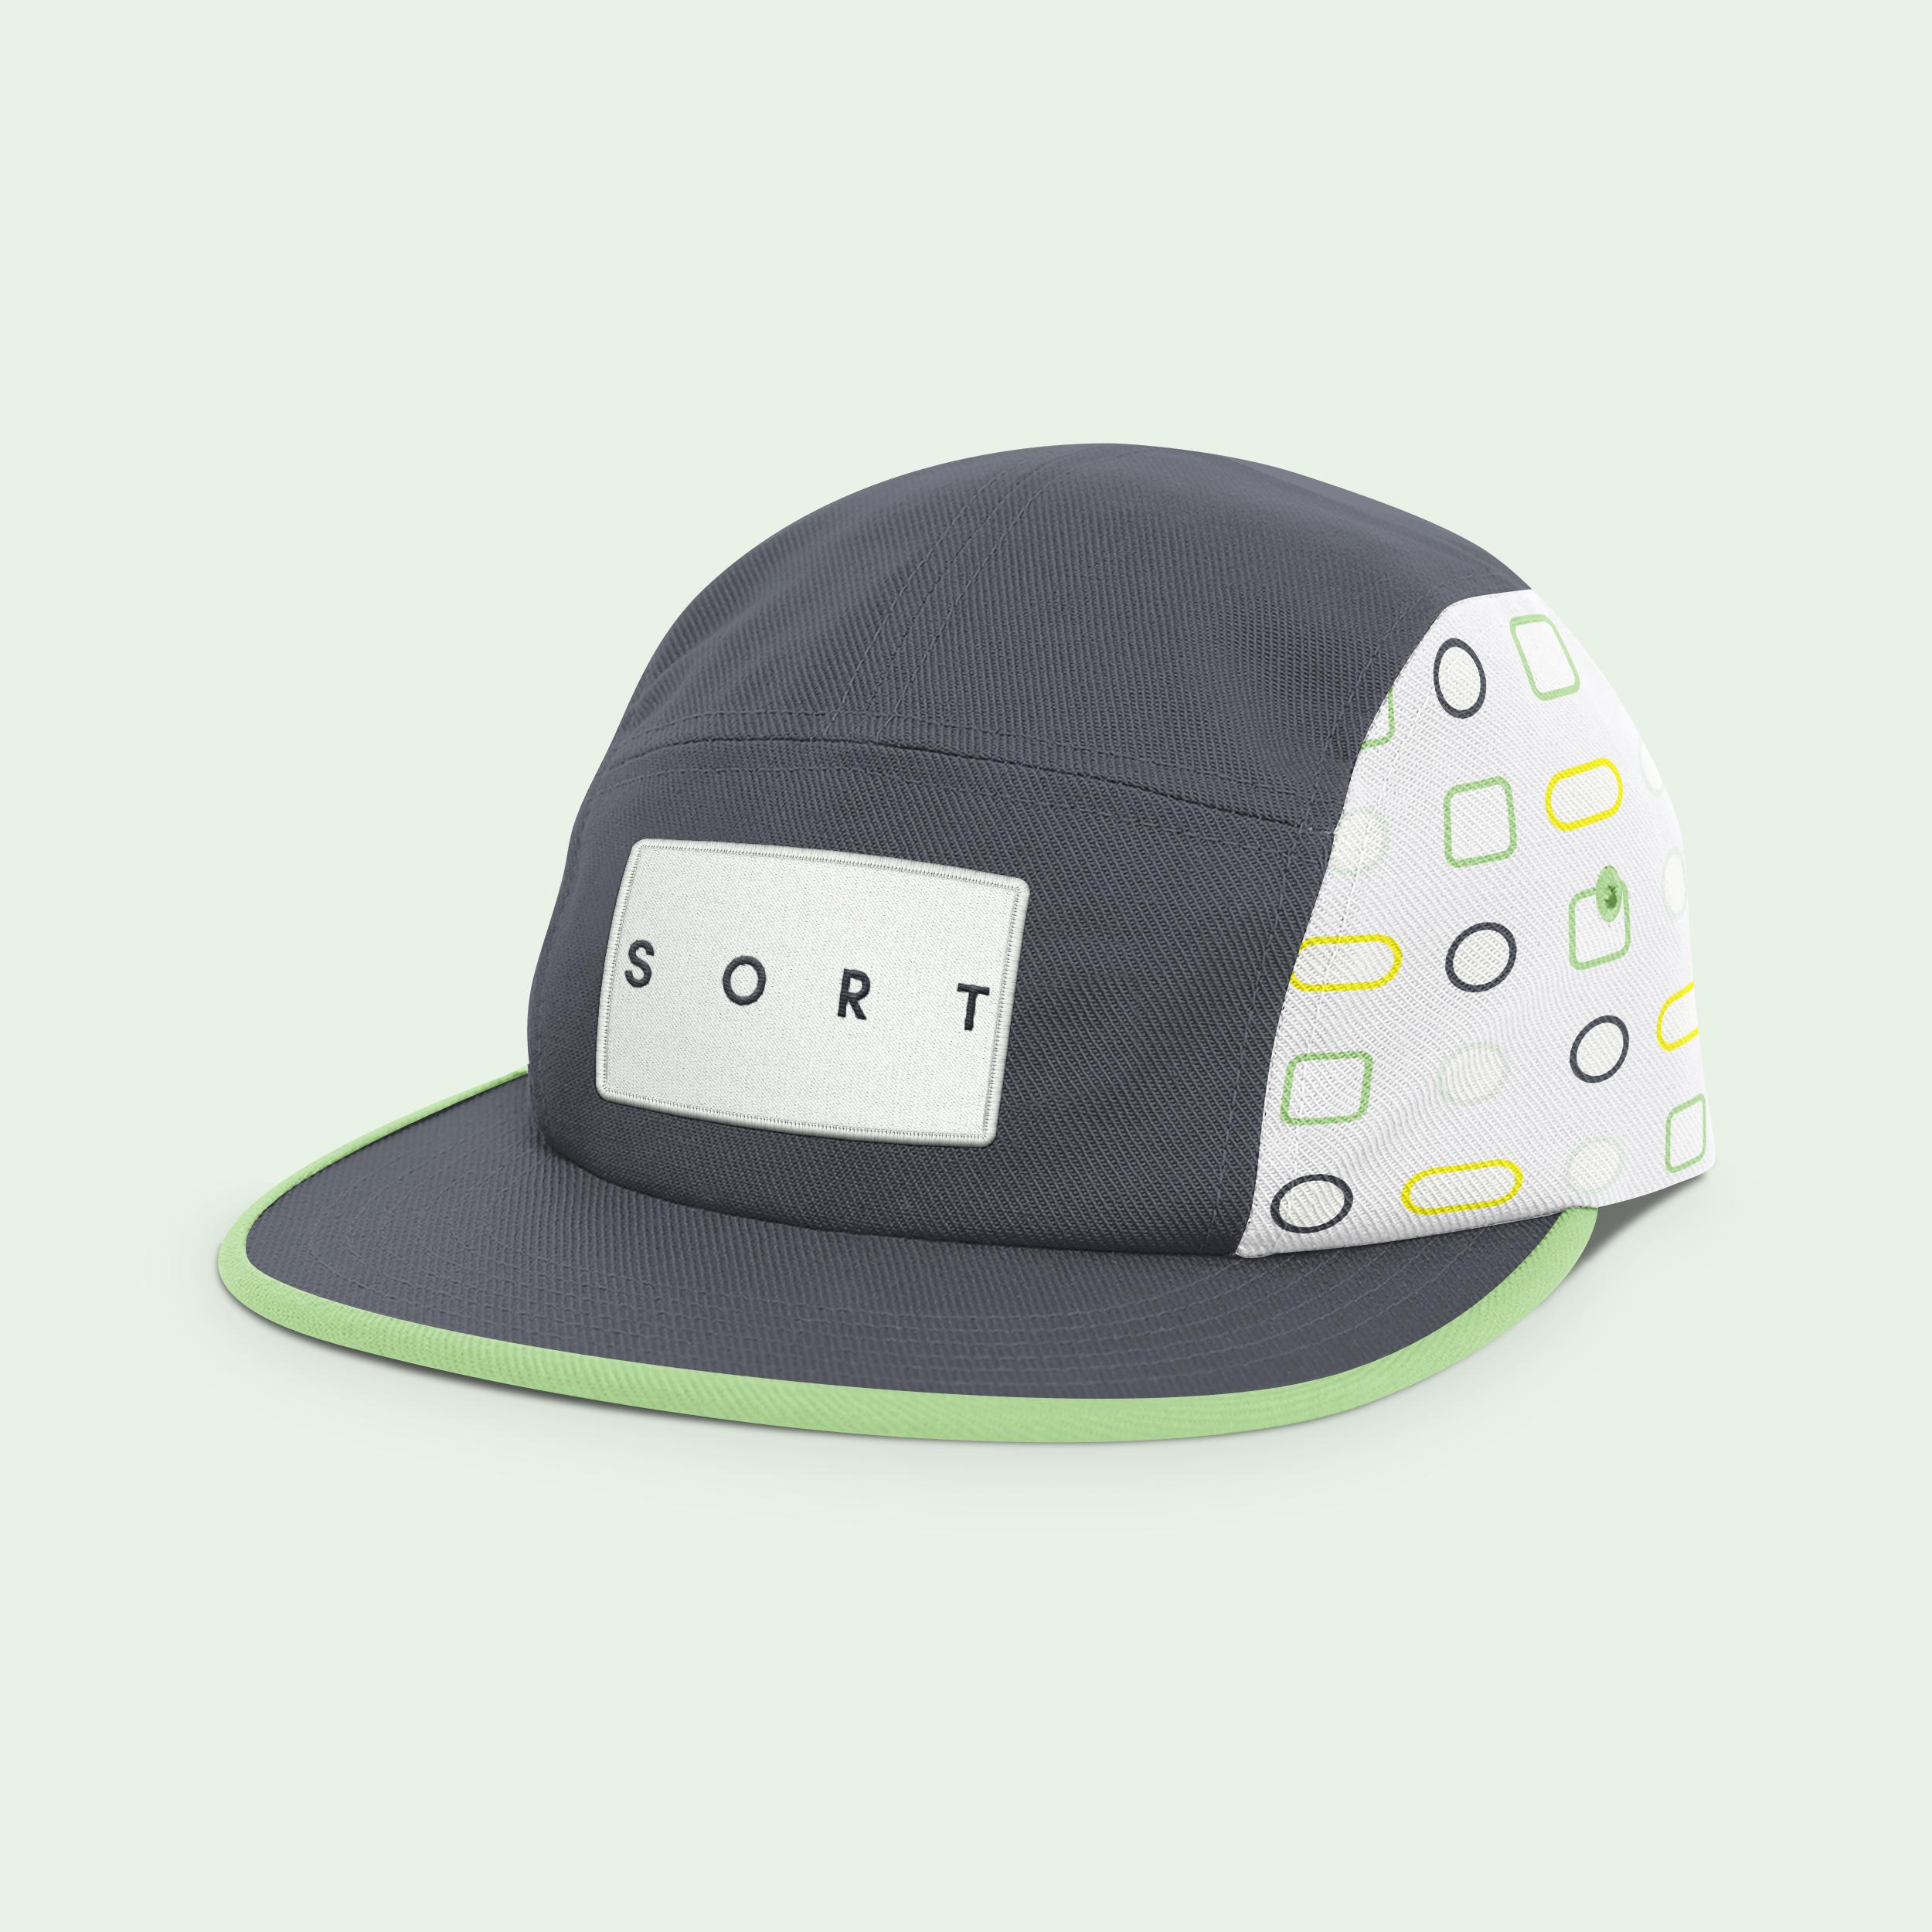 Promotional Hat.jpg